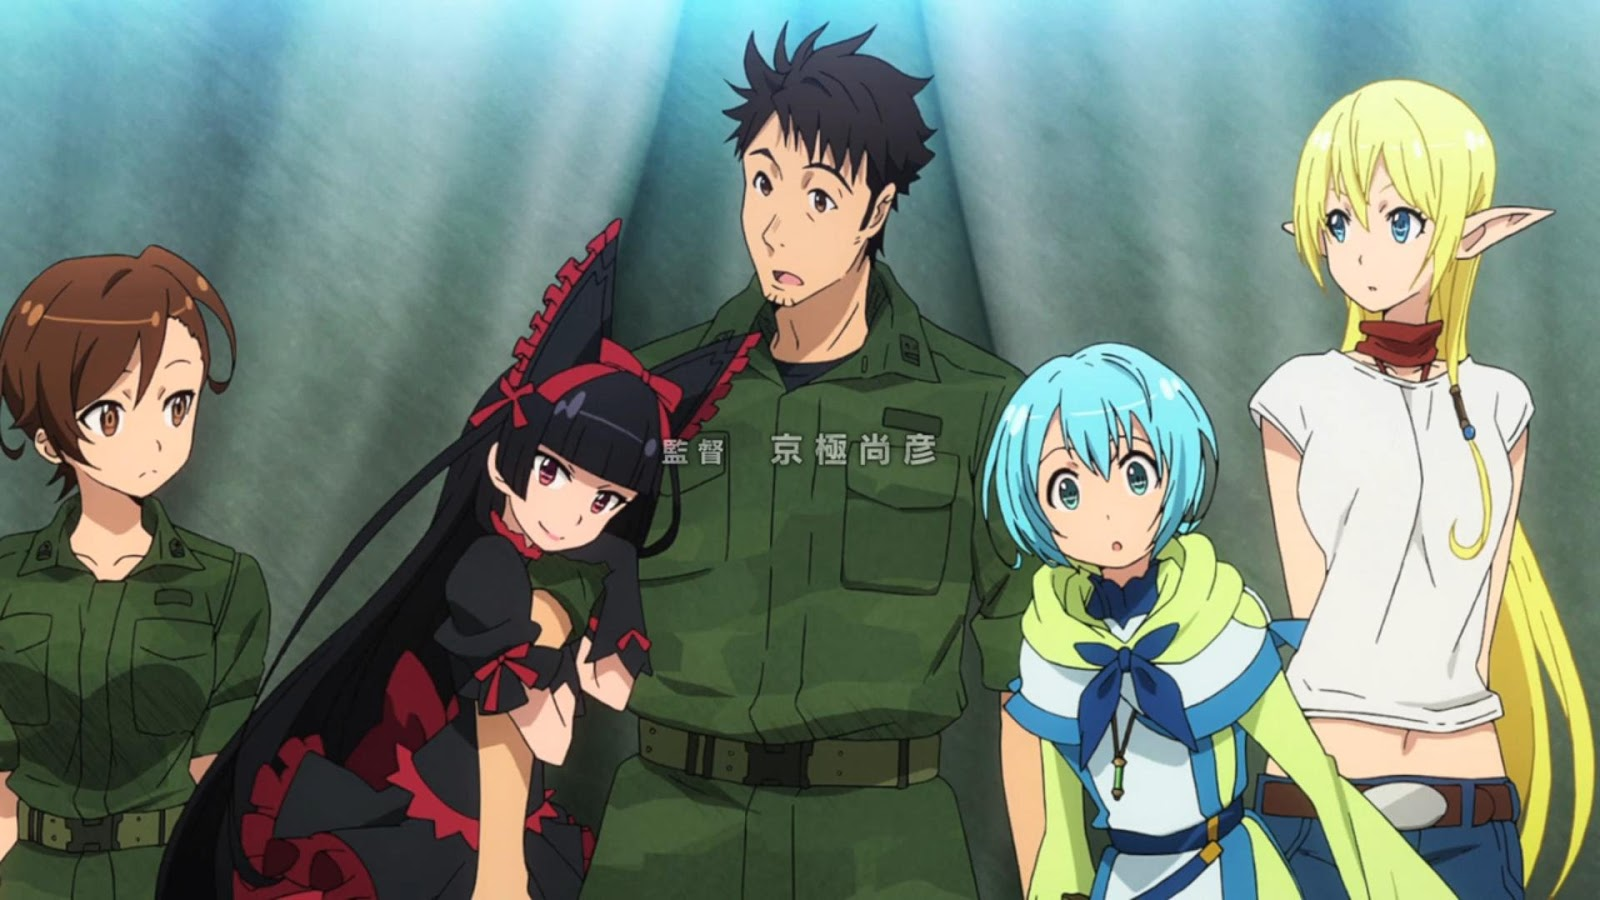 gate anime,steins gate anime, stein gate online, stain gate anime, stain gate, stain gate